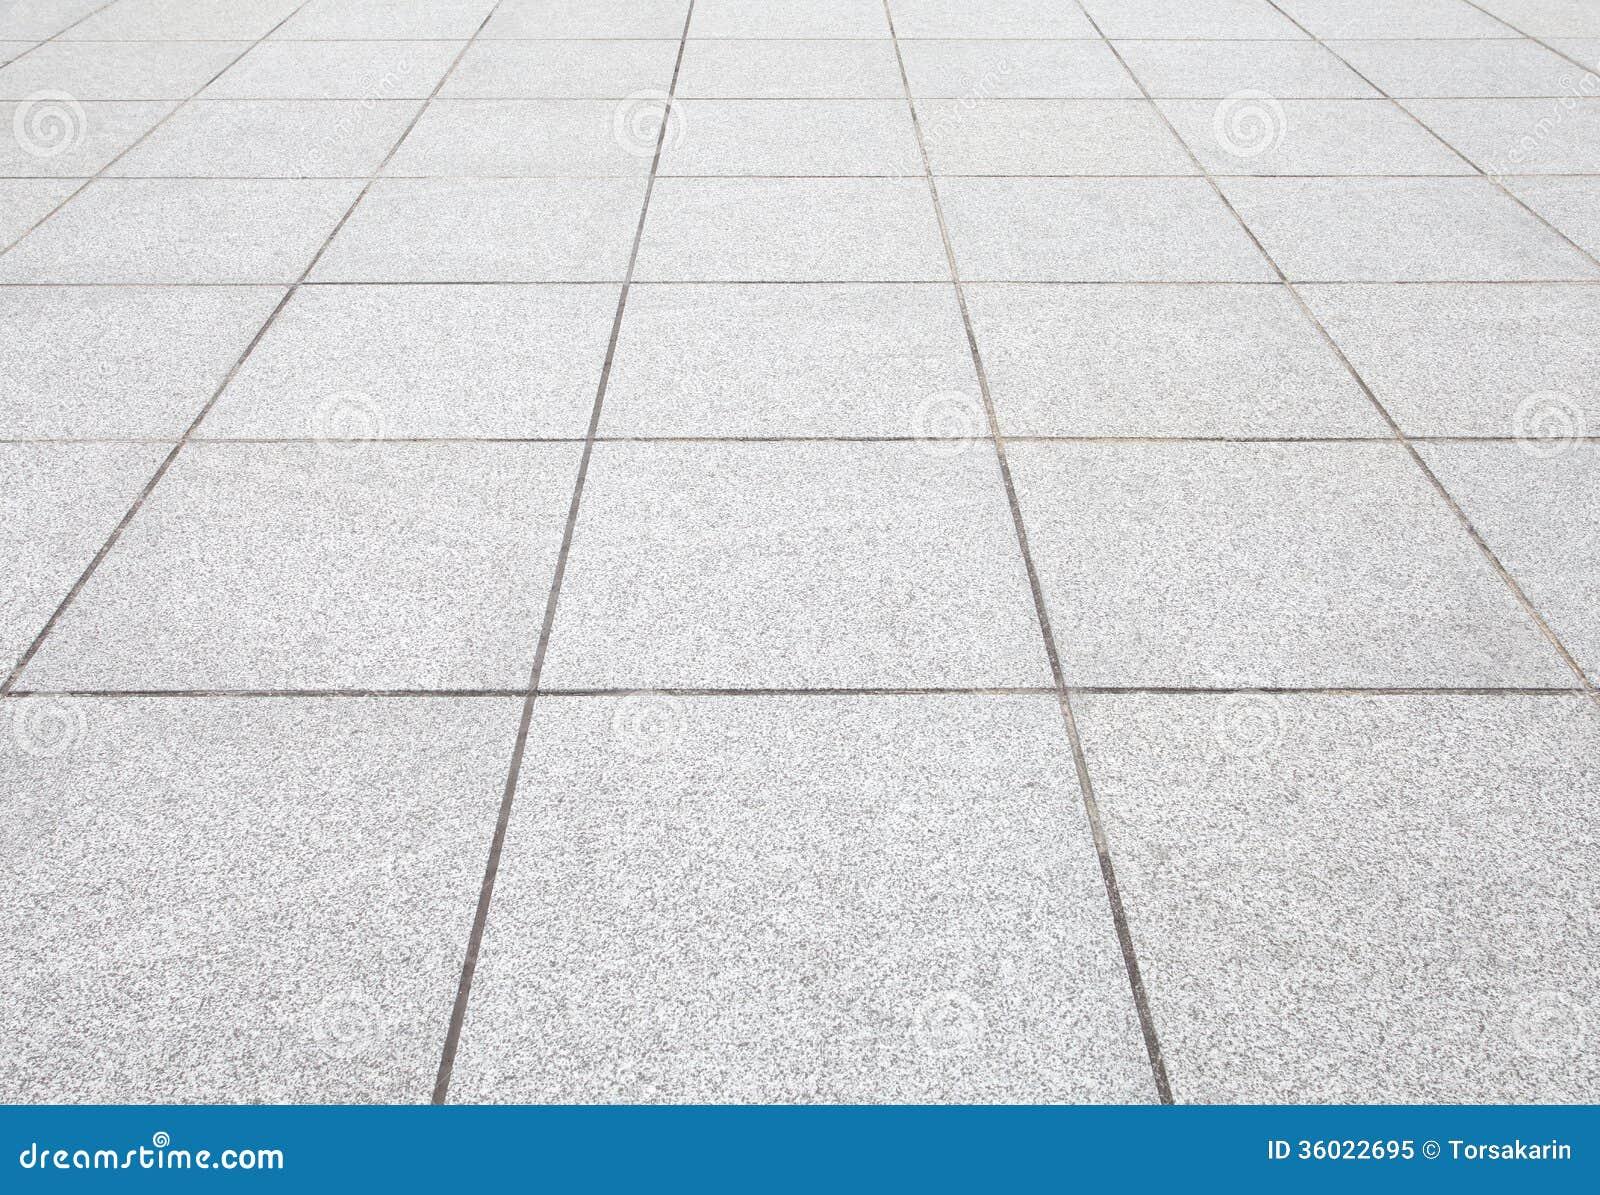 Harmonic Floor Tiles Background Royalty Free Stock Photo